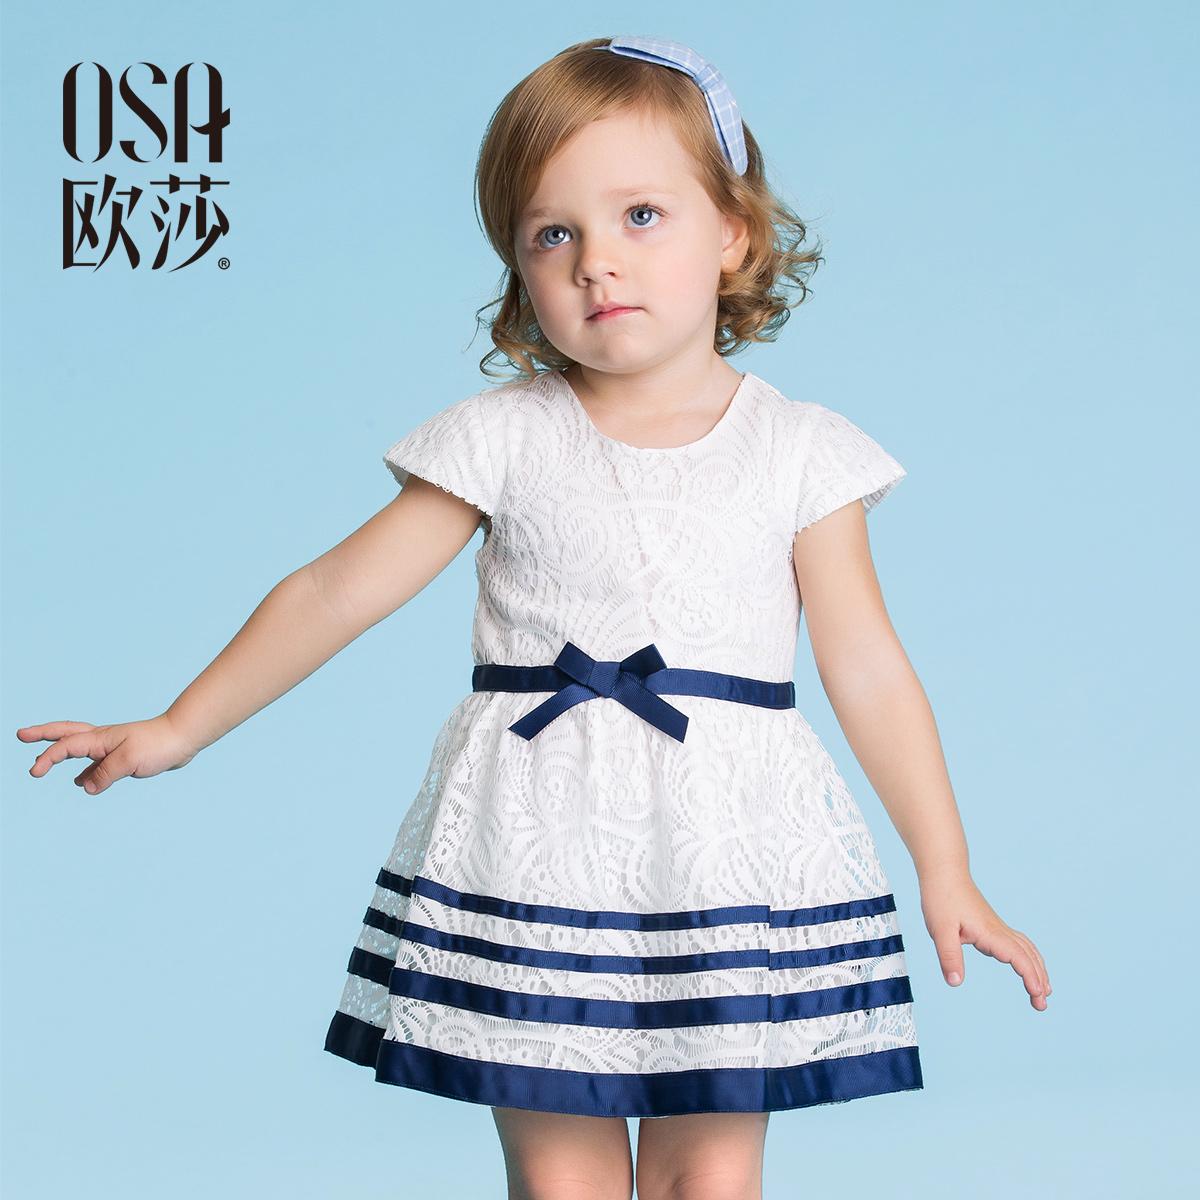 платье OSA kq424004 2015 penny vincenzi täielik skandaal i osa